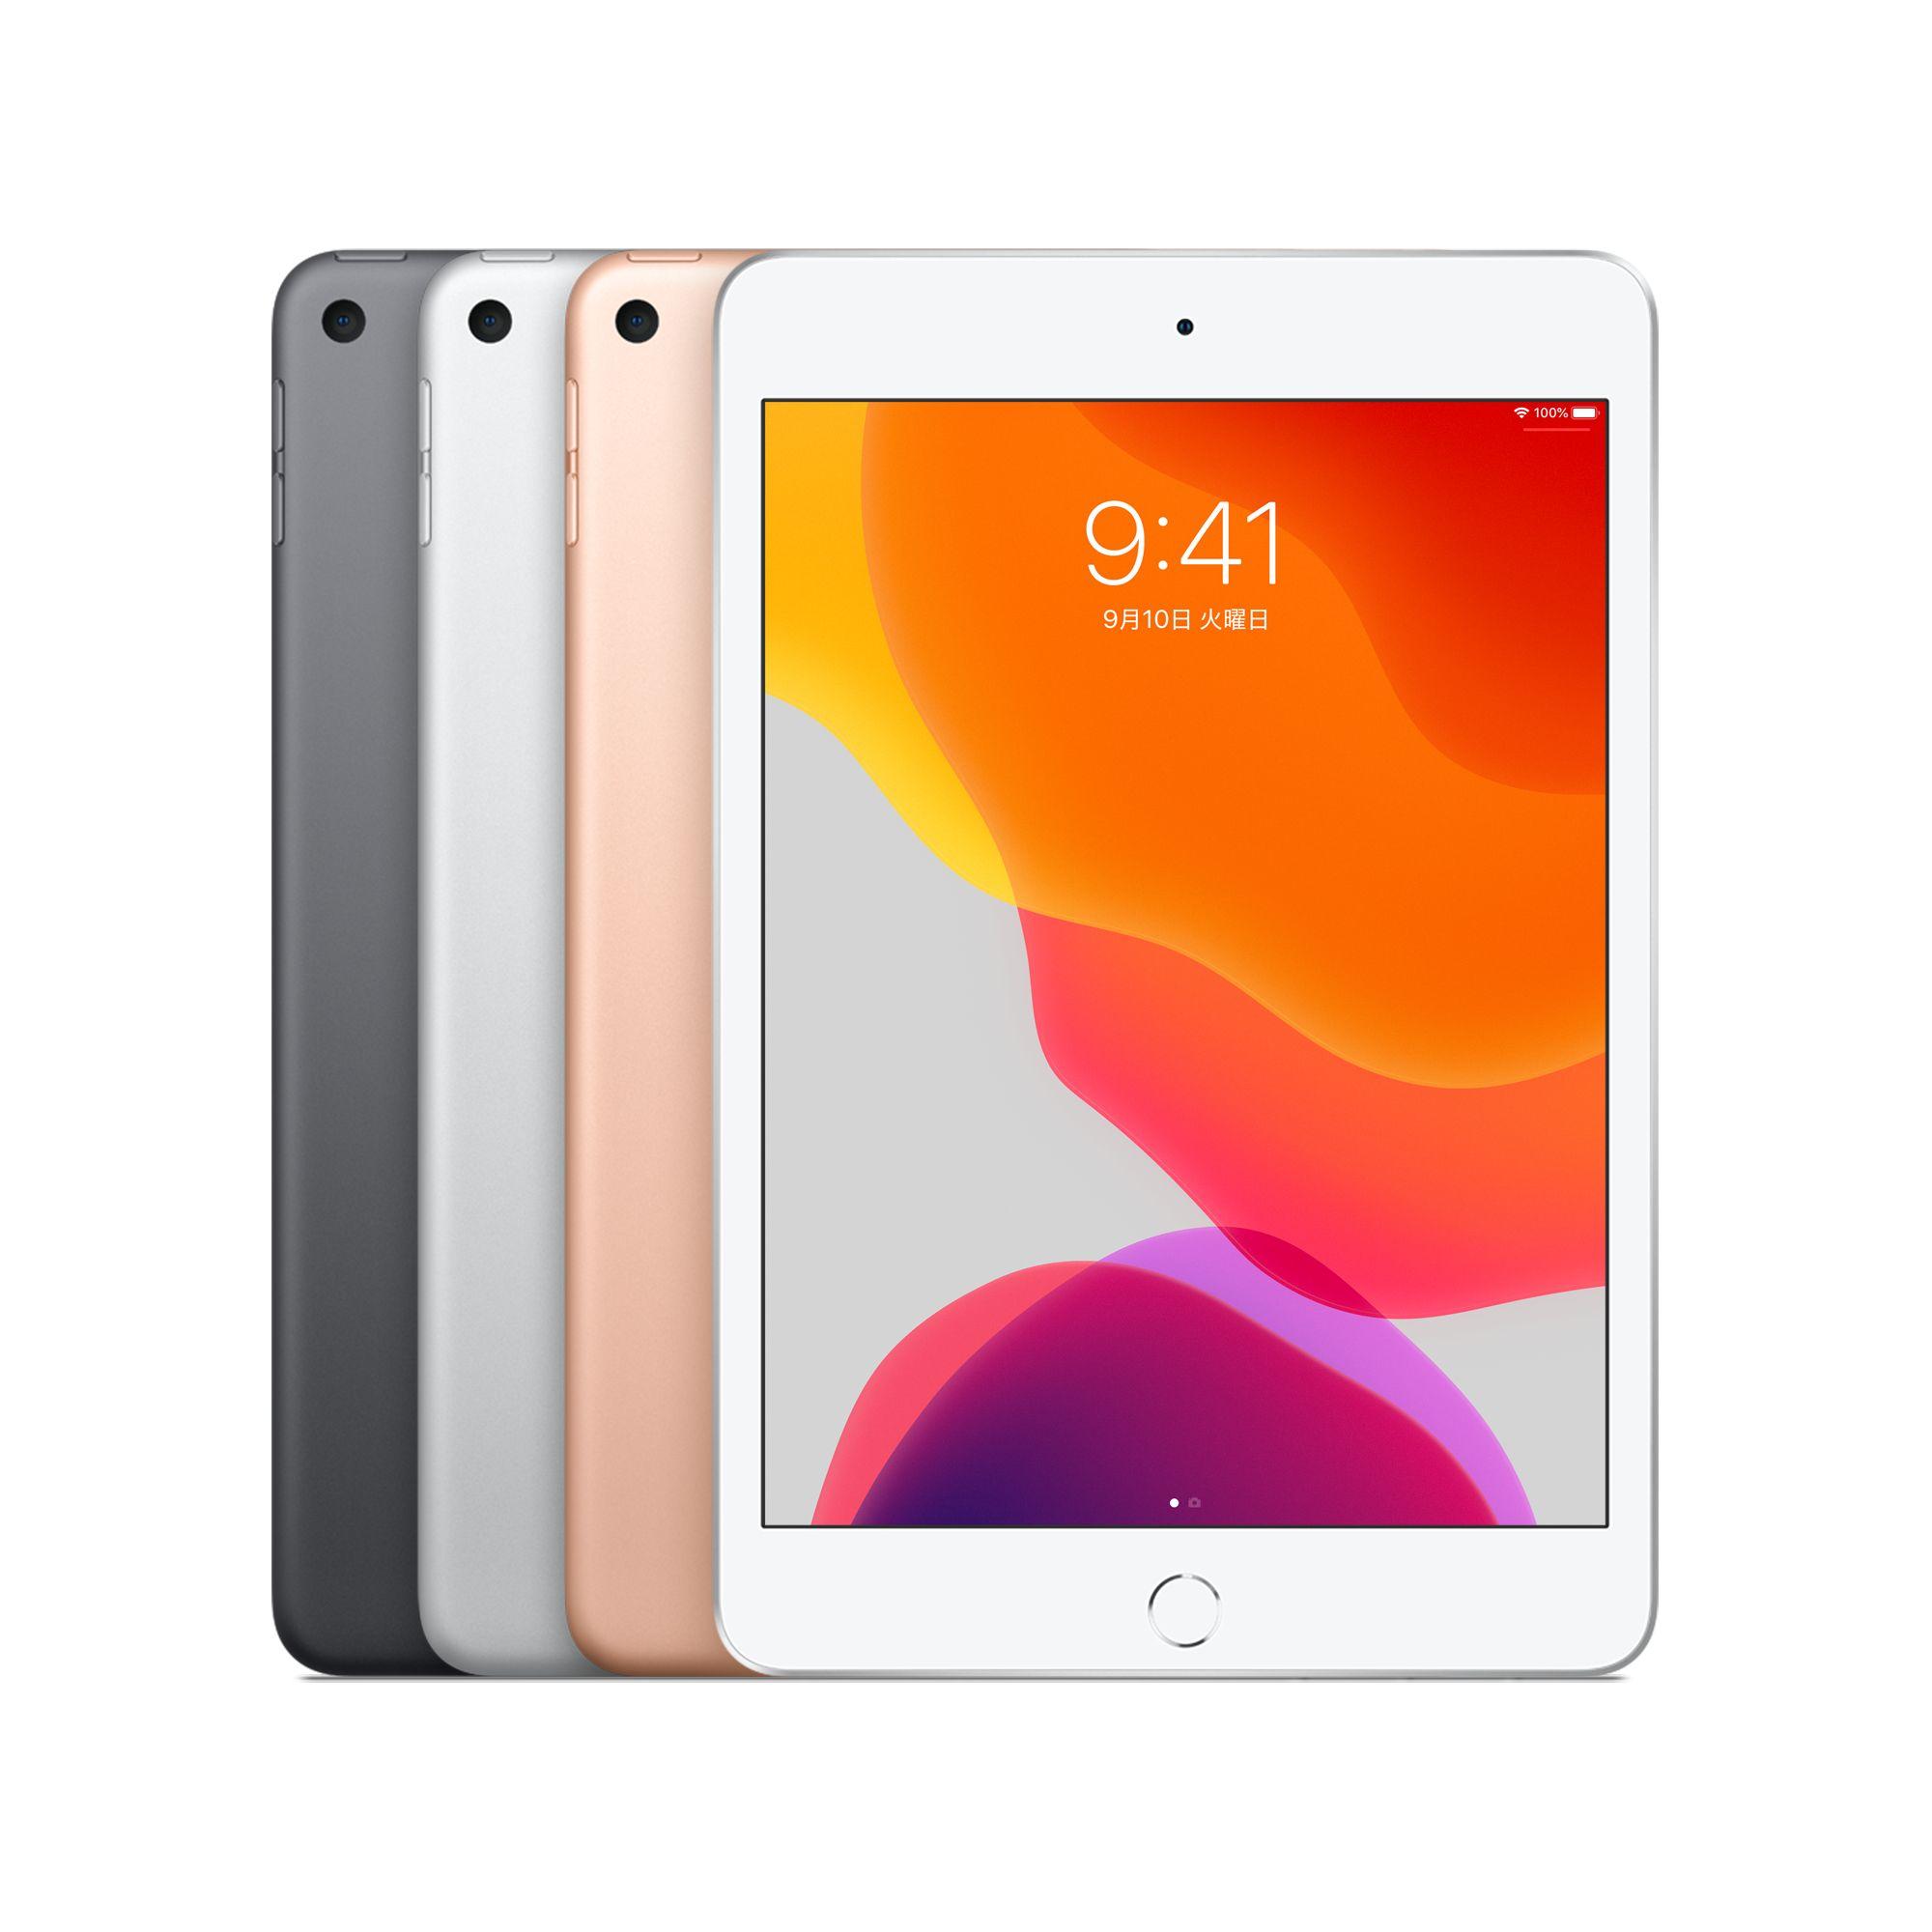 iPad miniの購入及び下取り - Apple(日本)